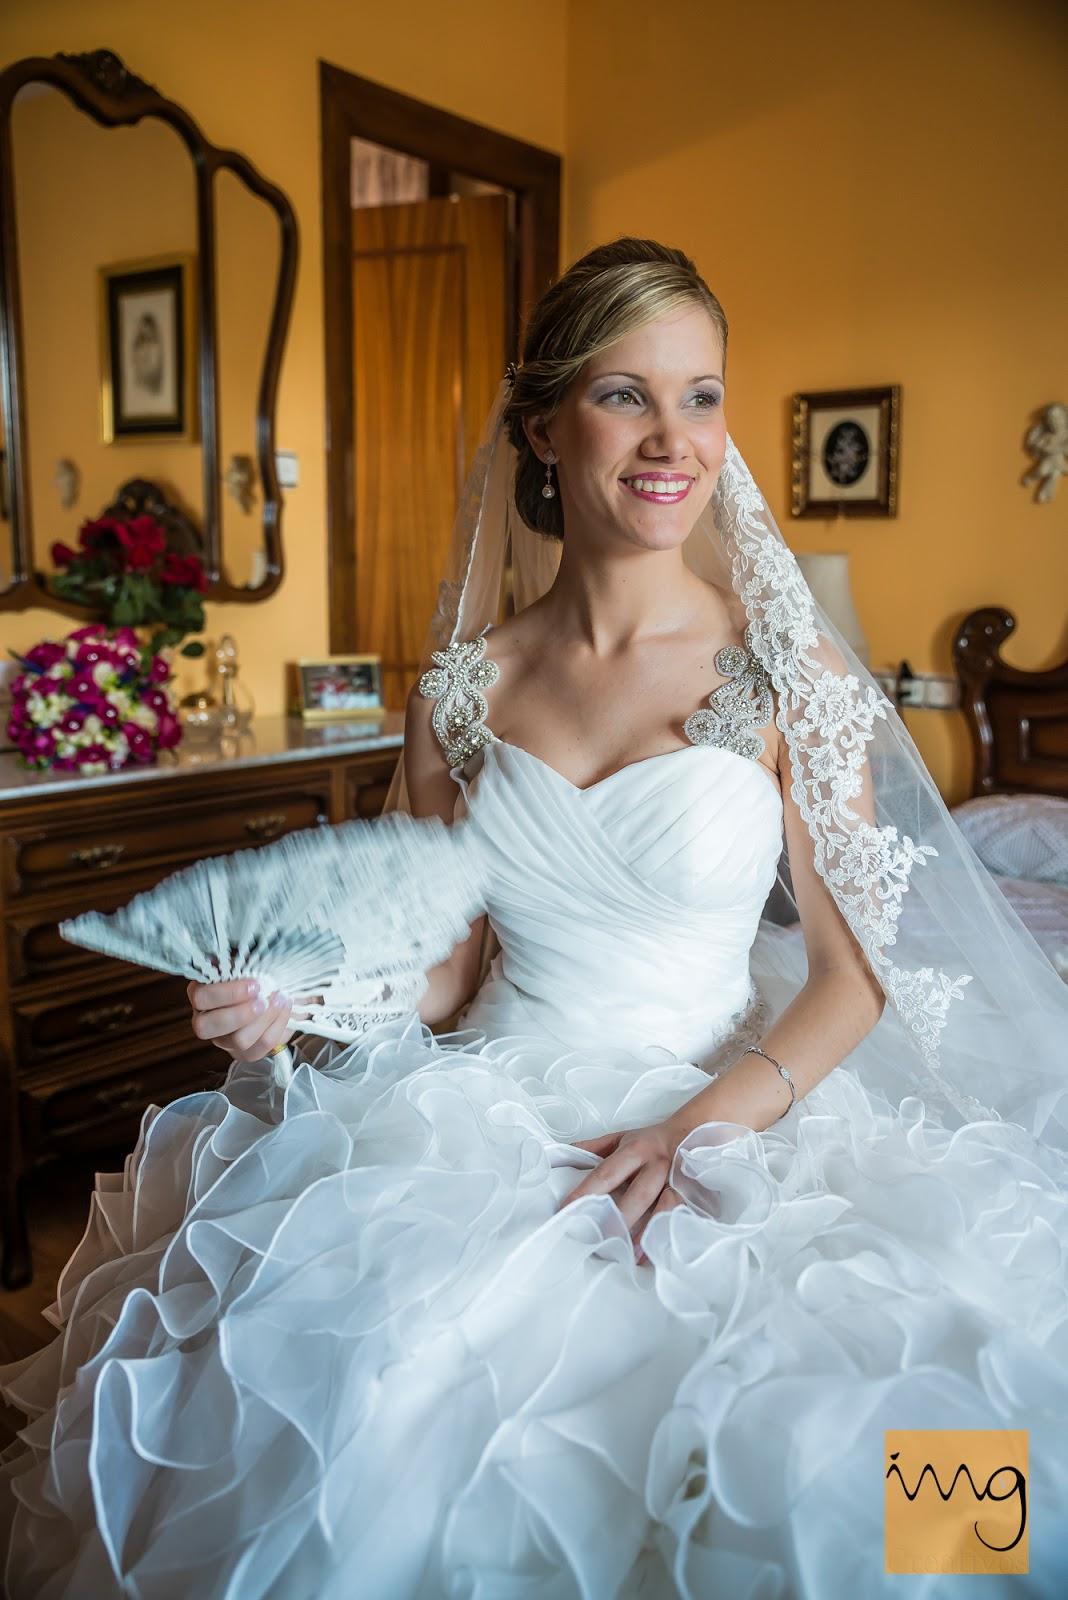 Foto de la novia preparada para su boda